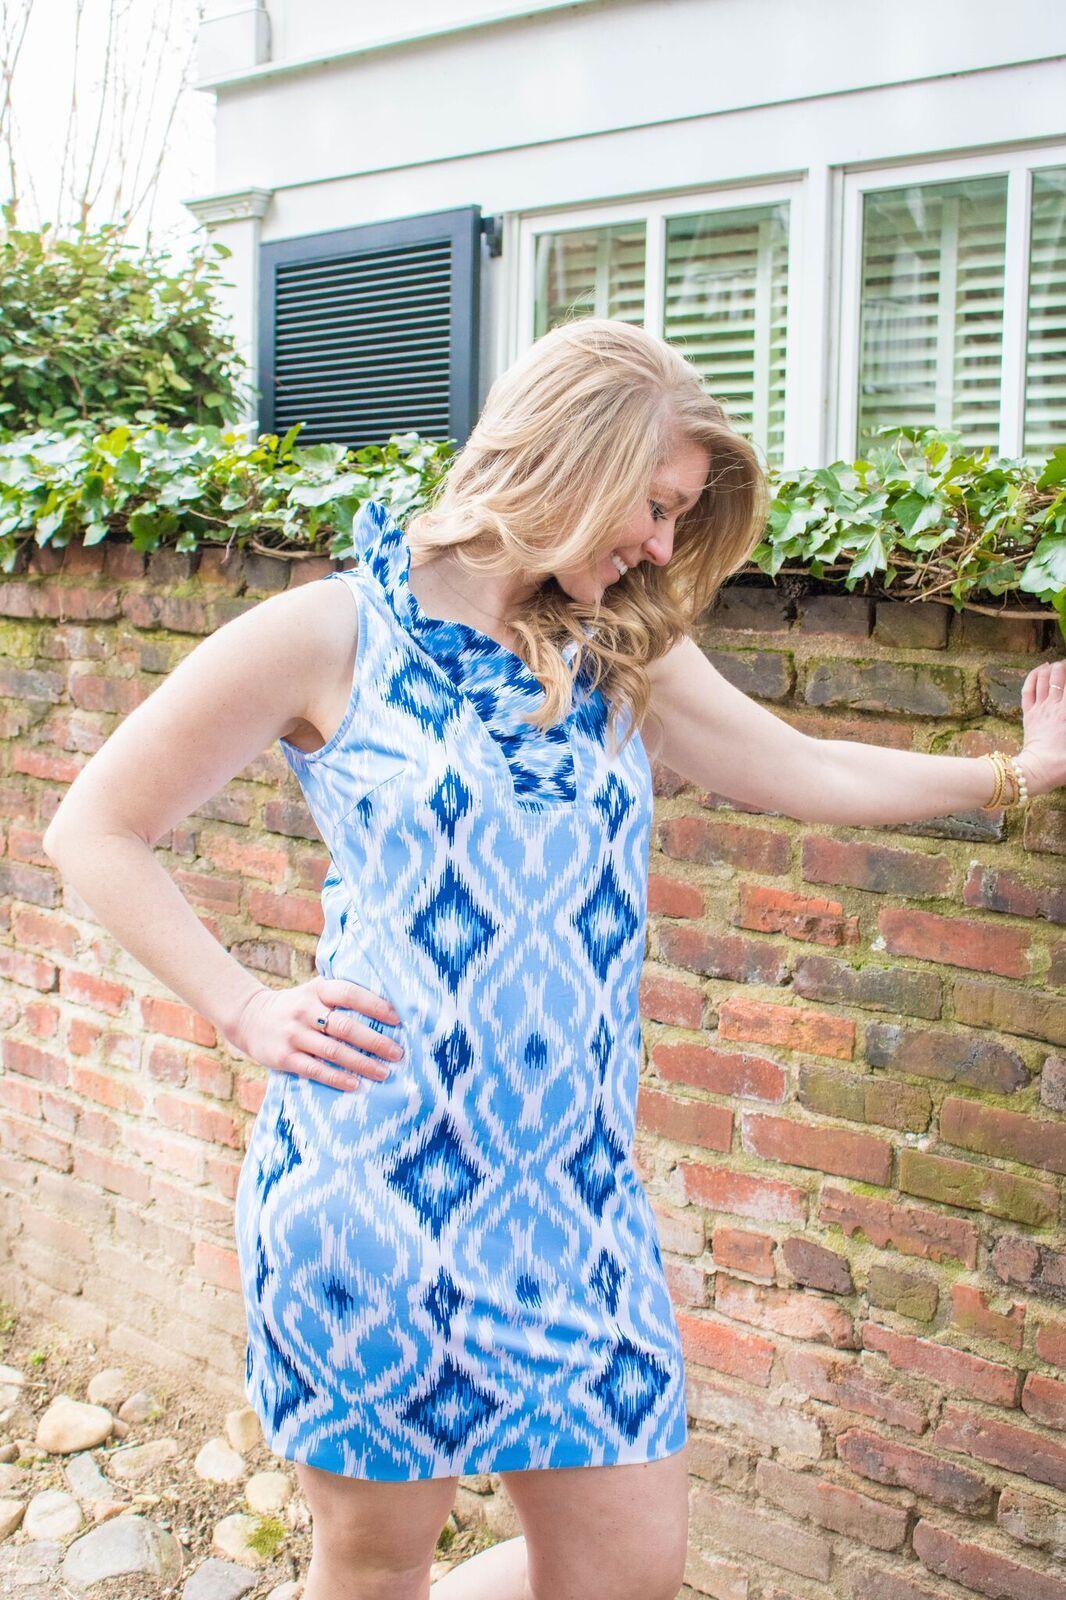 19f16bb5183 We are loving this new Gretchen Scott Blues print on the classic ruff neck sleeveless  dress